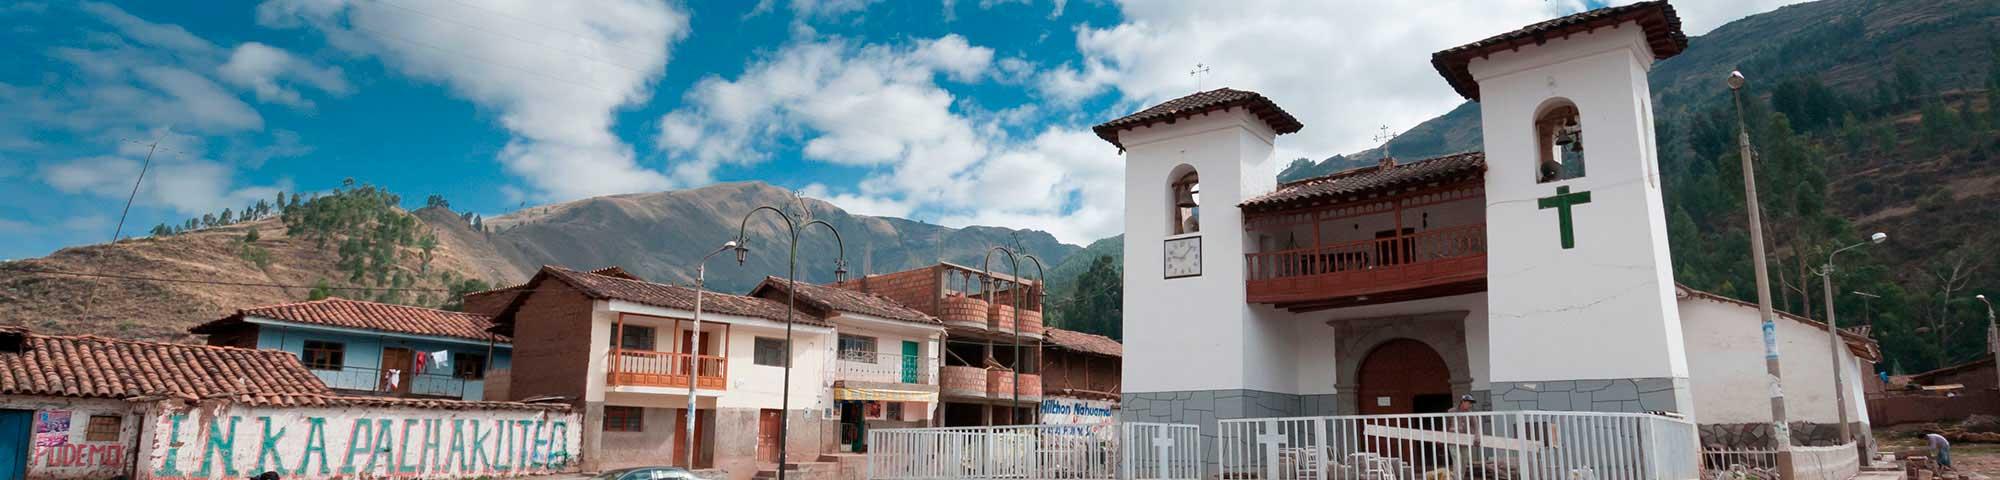 Poblado de Huasao